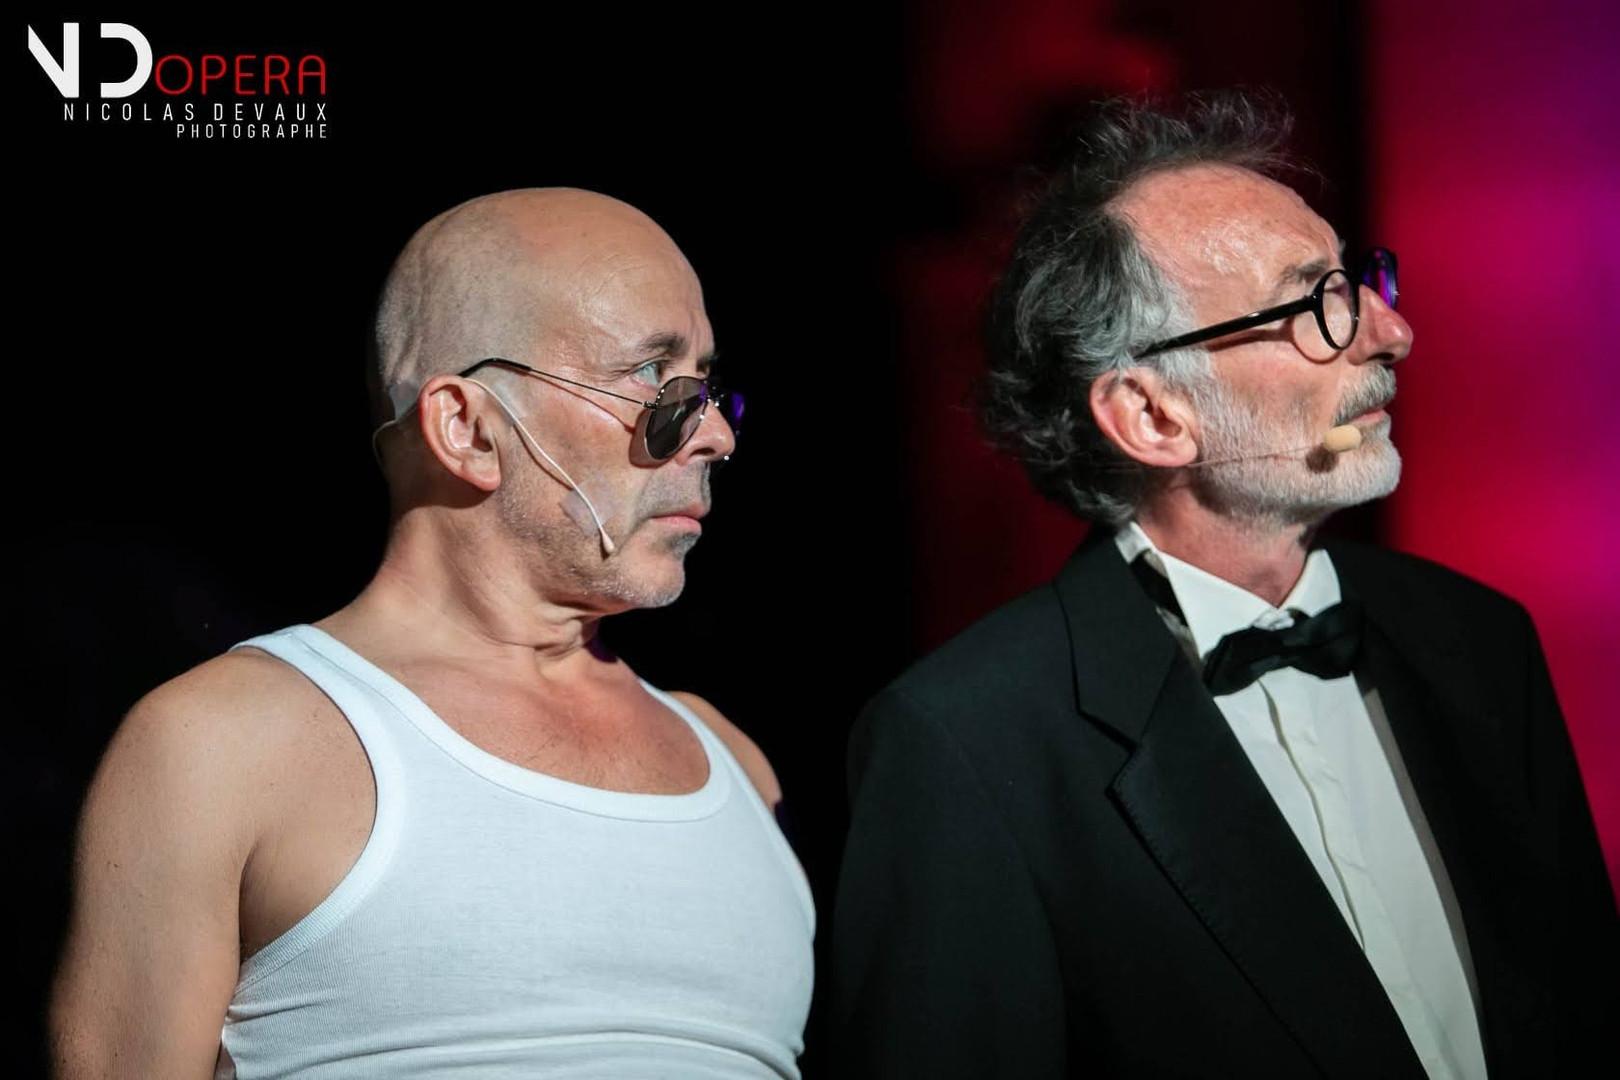 Mattieu Lécroart et Jean Manifacier